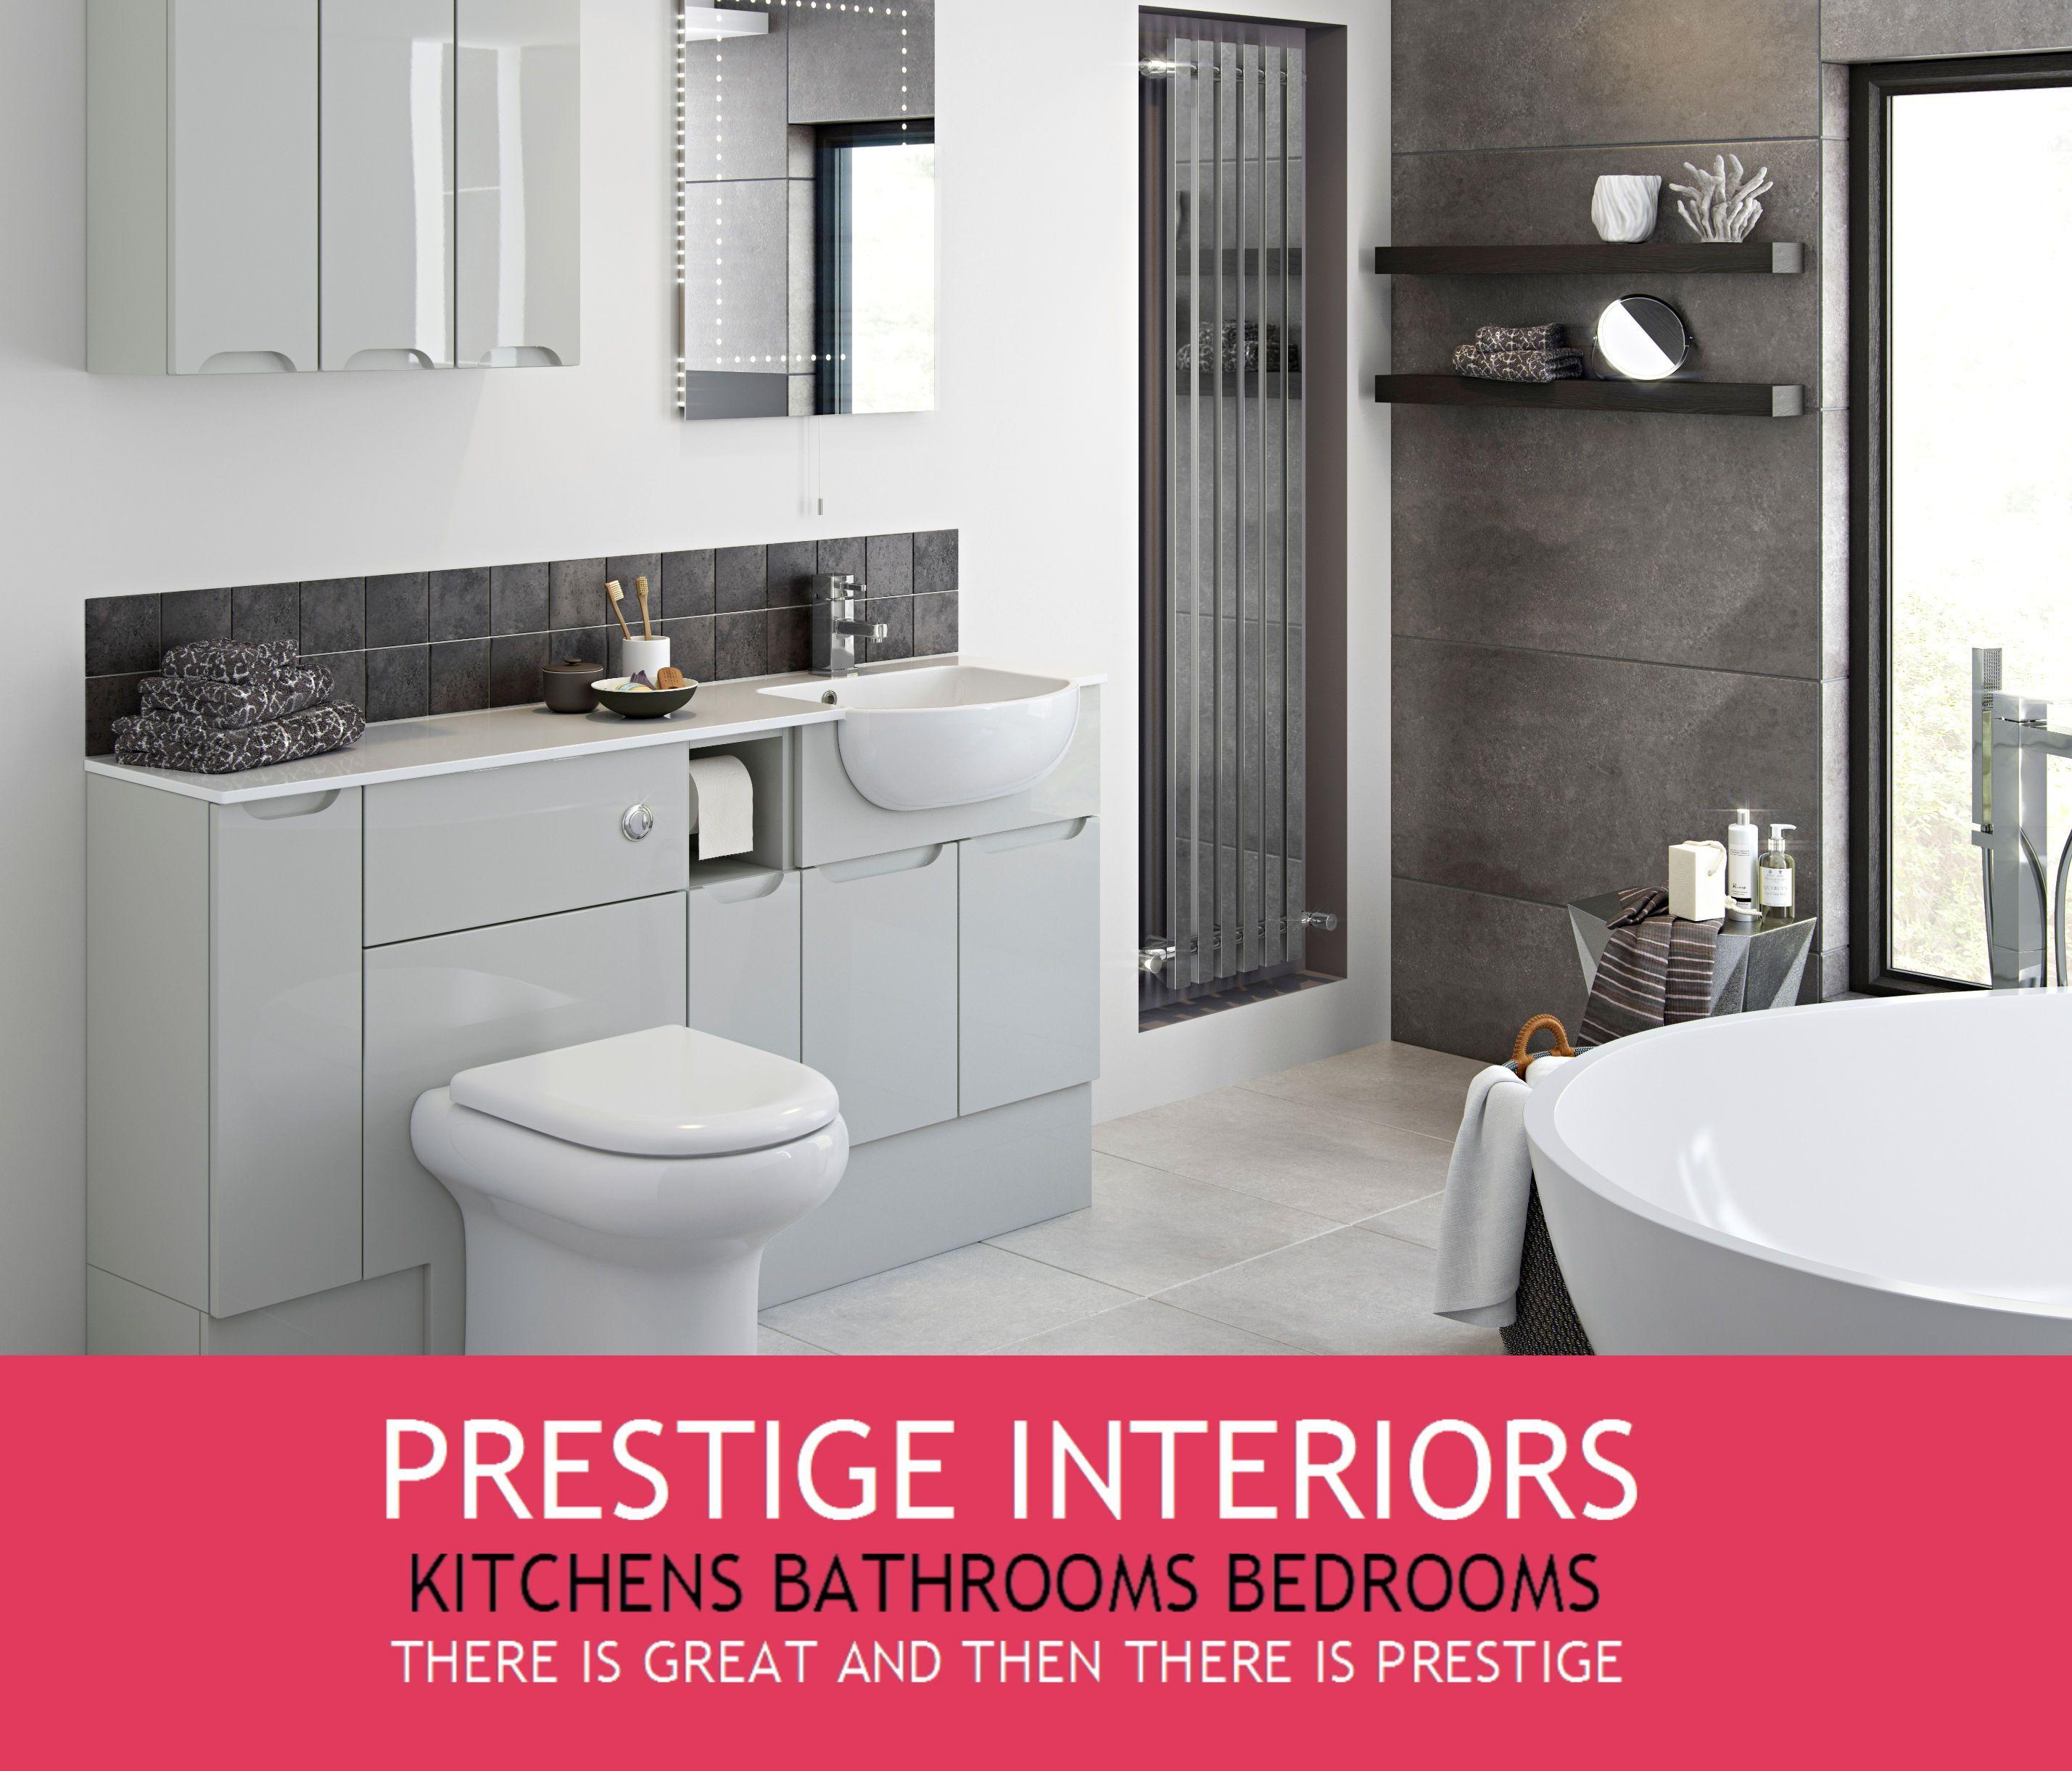 Bathroom Tiles Eastbourne we currently have a big bathroom ex display sale on to make way